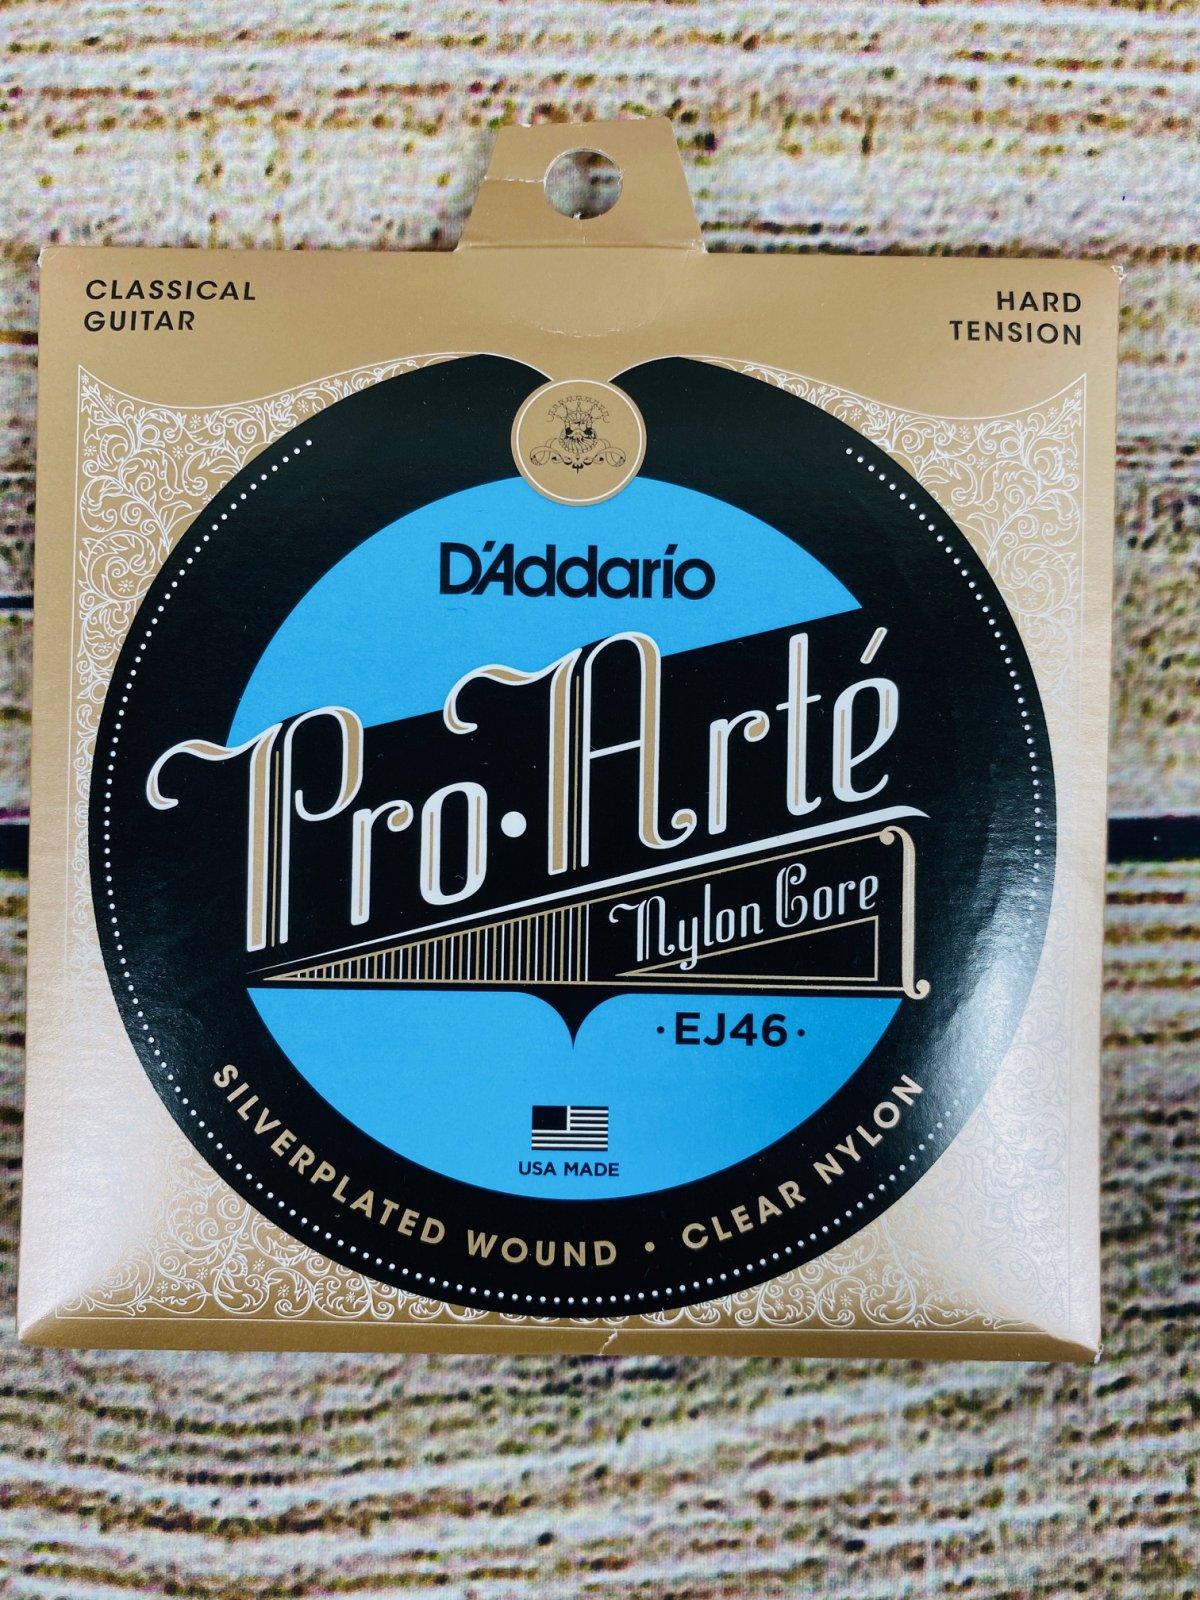 D'Addario Pro-Arte Classical Guitar Strings - Hard Tension